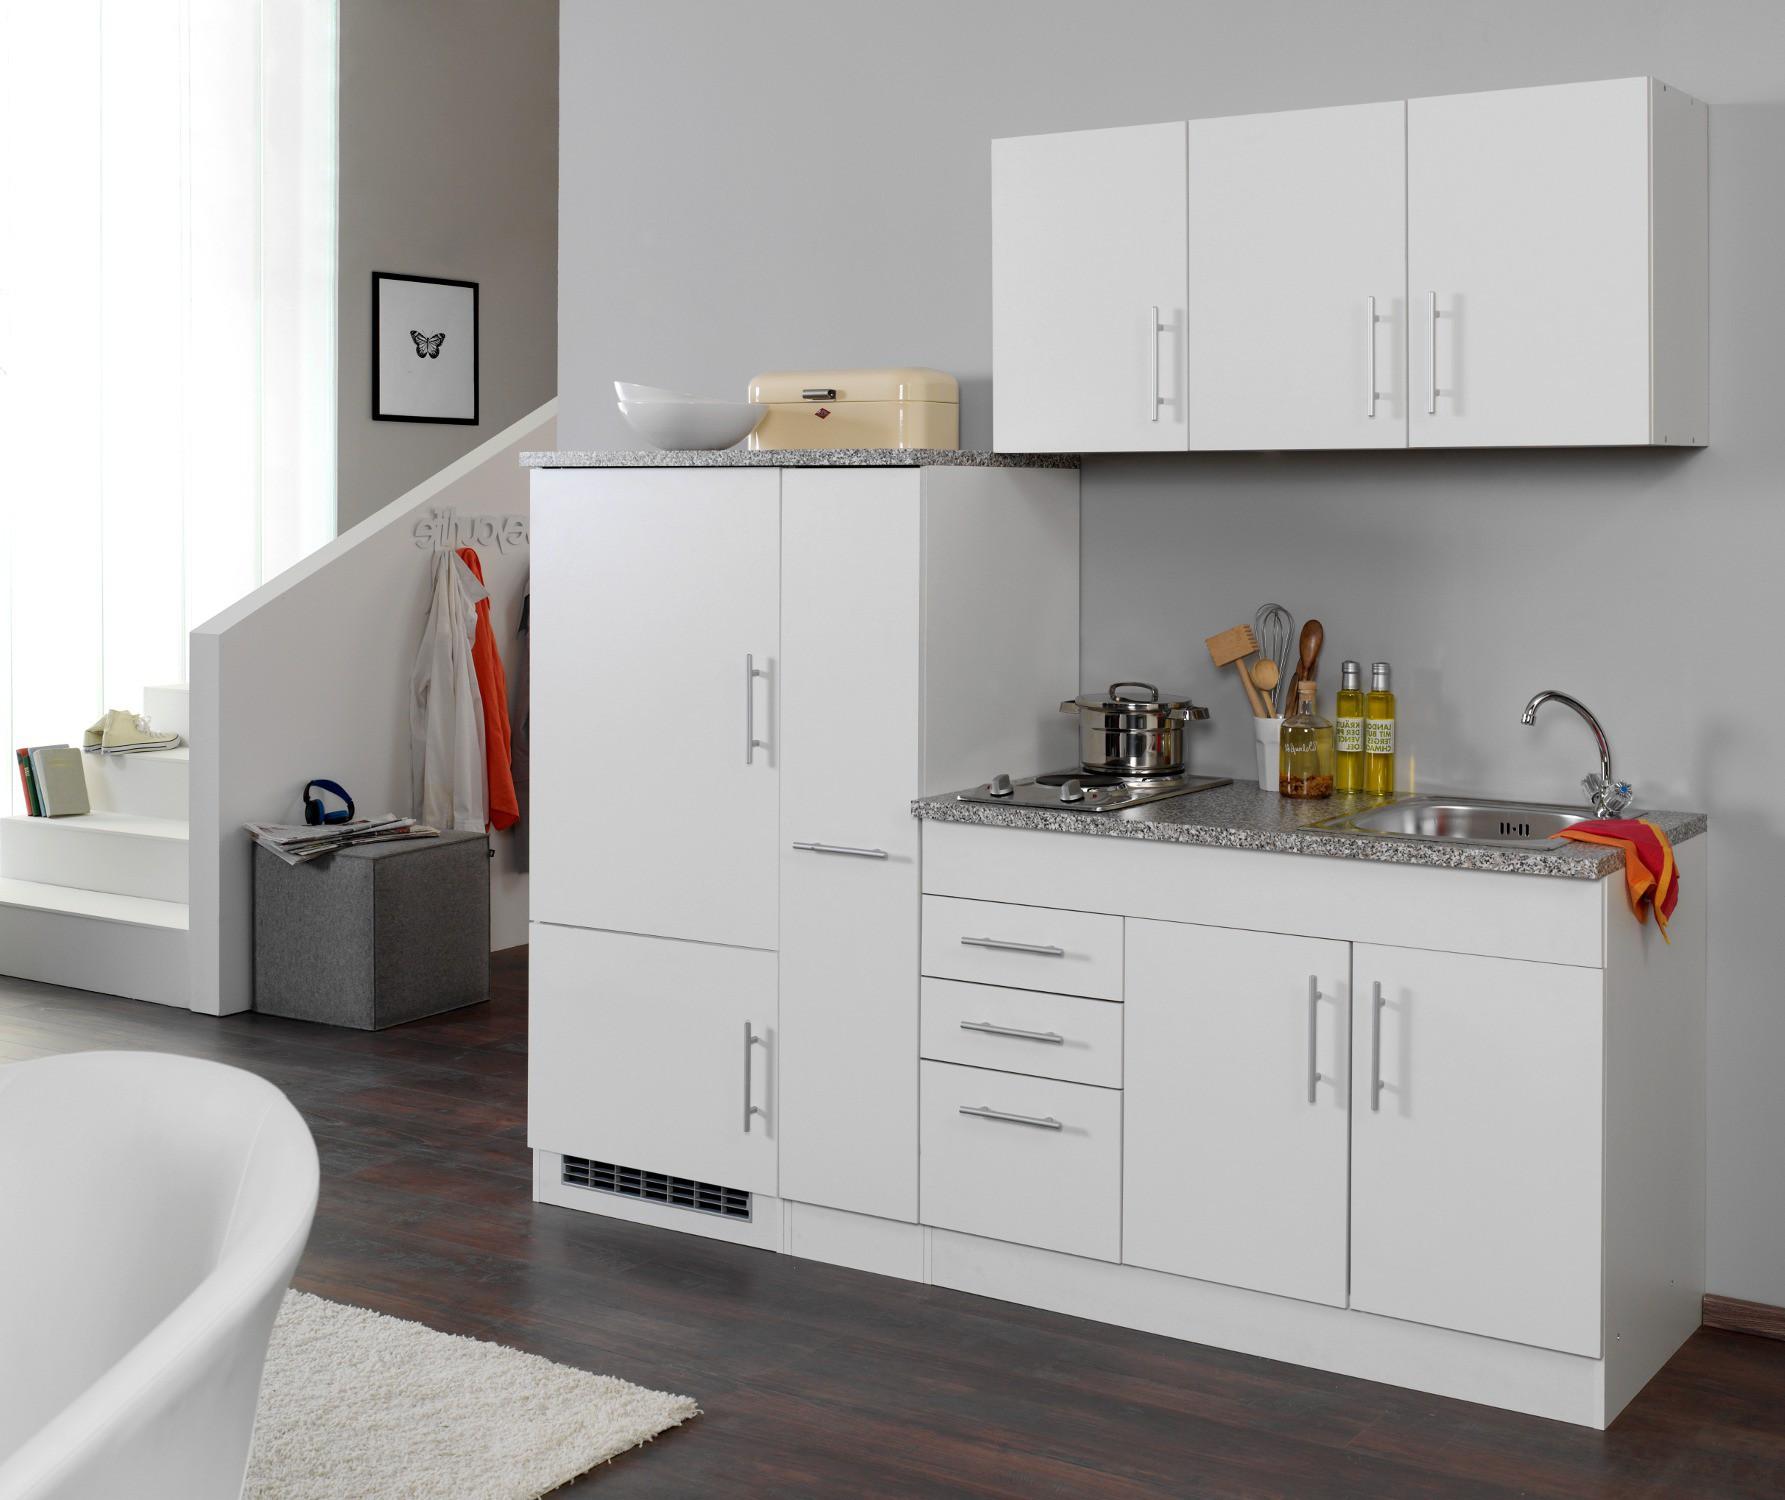 singlek che berlin breite 210 cm wei k che singlek chen. Black Bedroom Furniture Sets. Home Design Ideas